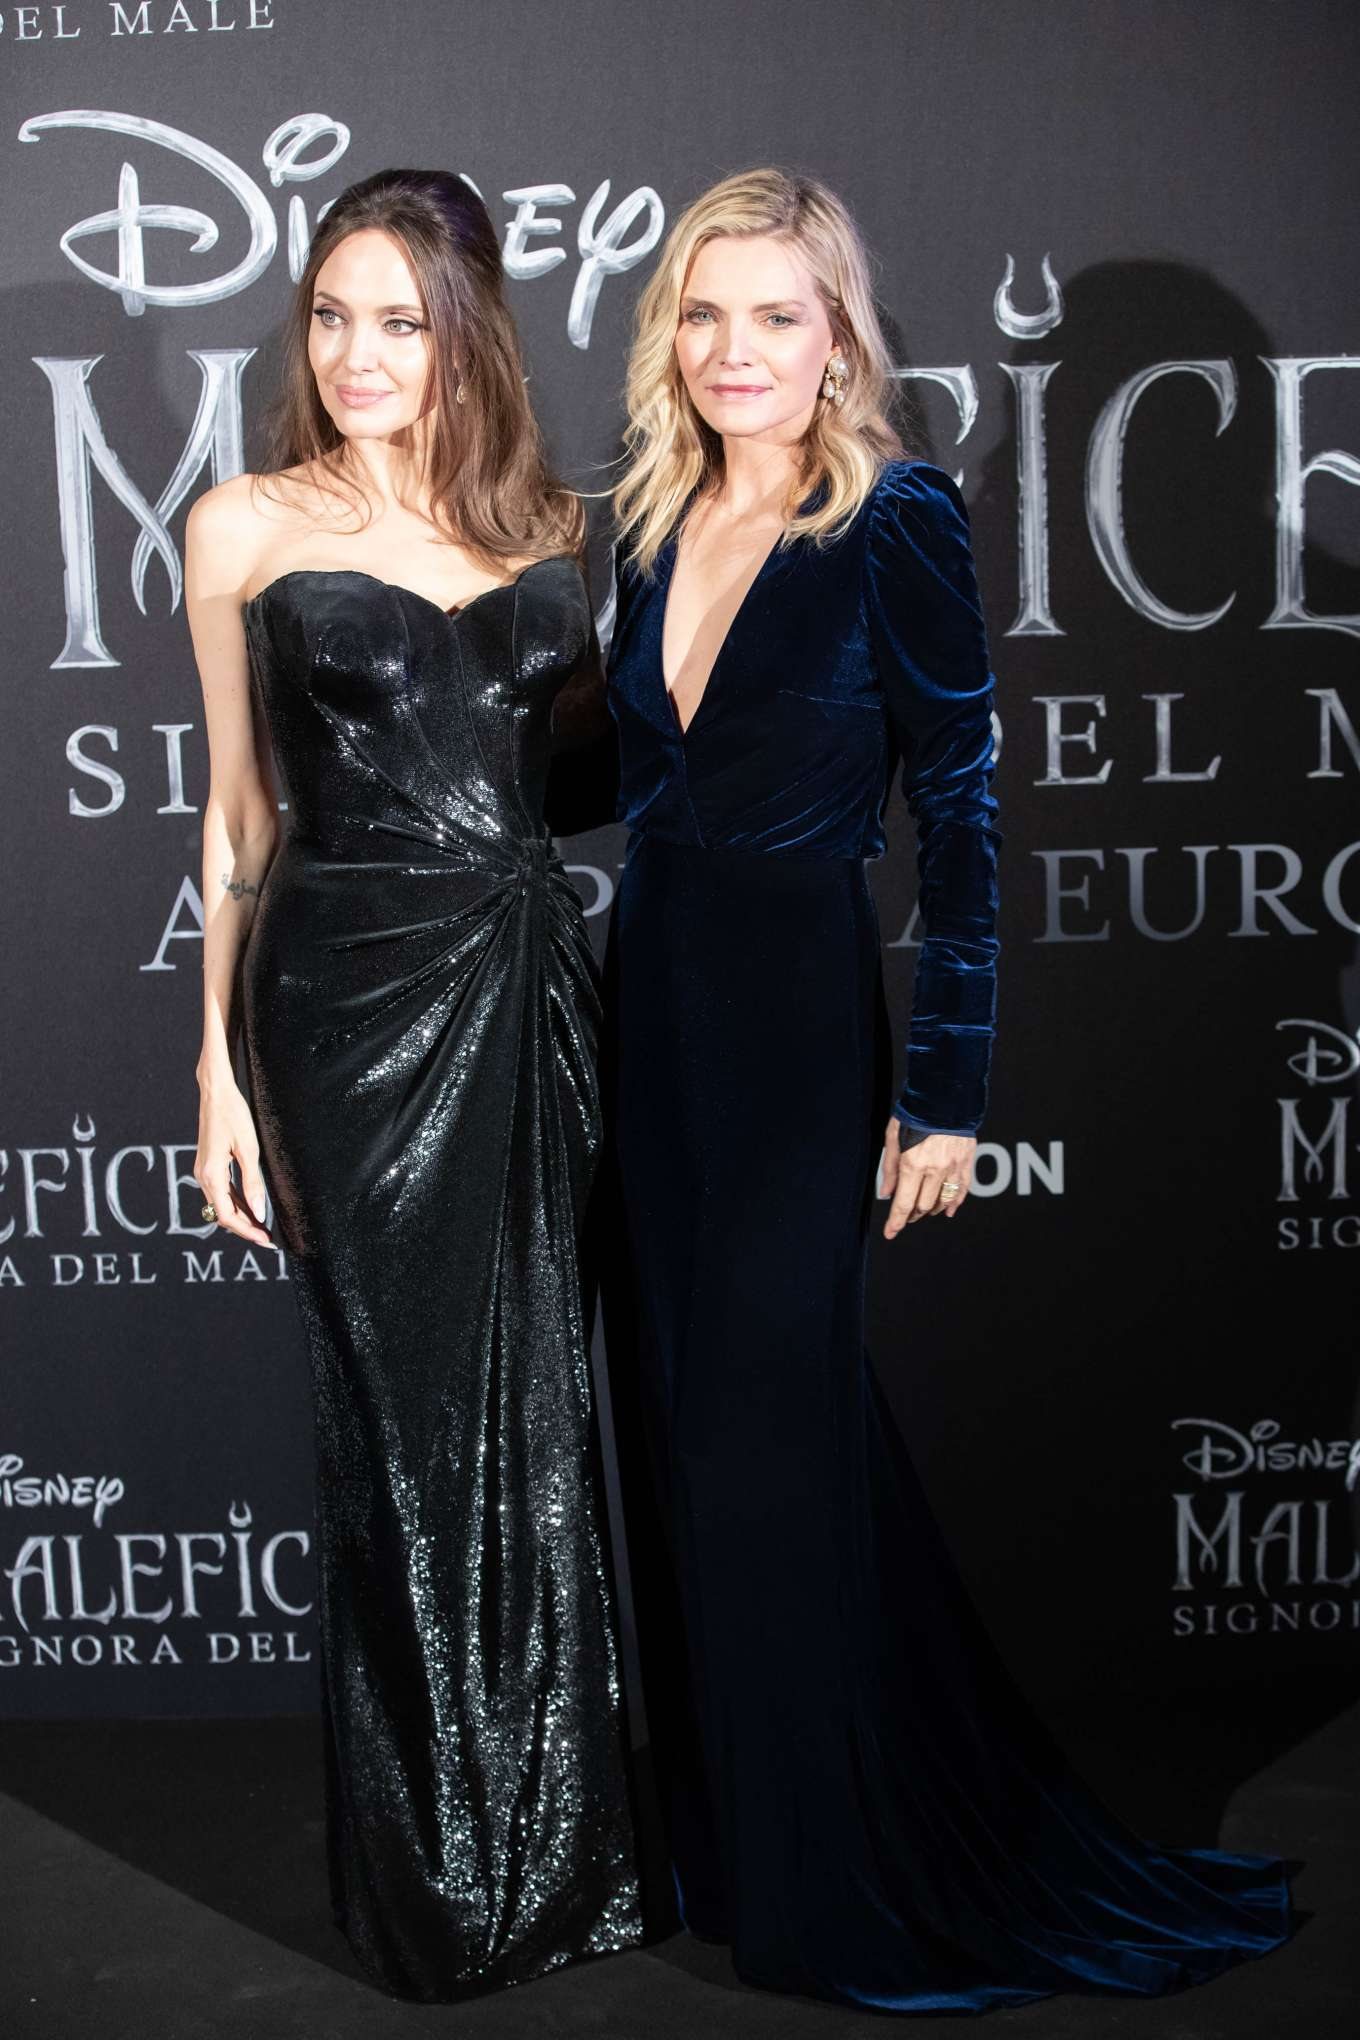 Michelle Pfeiffer 2019 : Michelle Pfeiffer – Maleficent: Mistress Of Evil Premiere in Rome-09